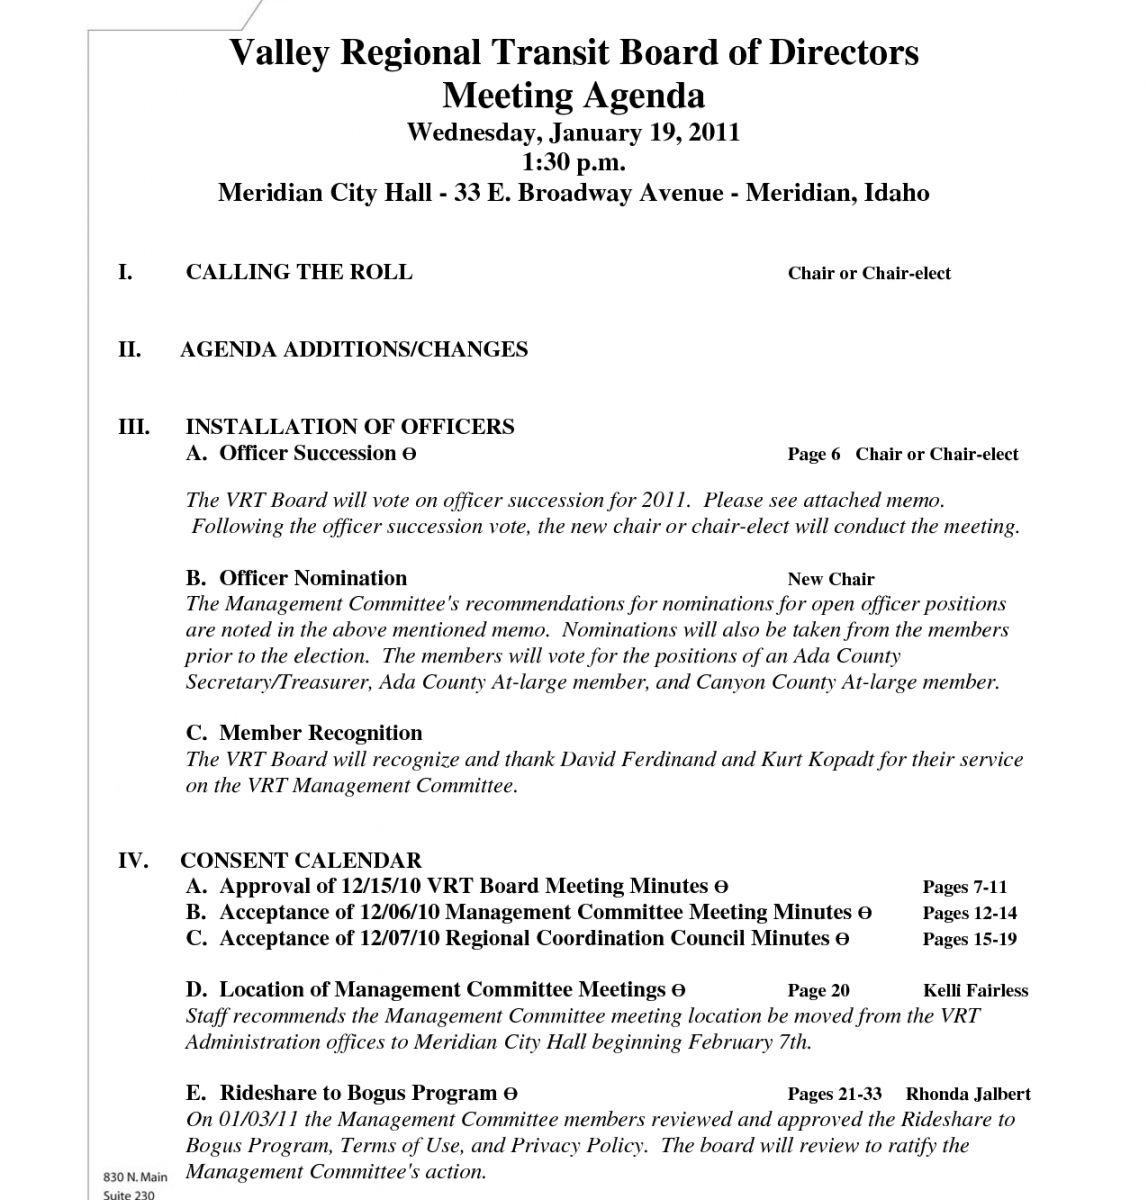 Free Agenda Format For Board Meeting Monzaberglaufverband Inside